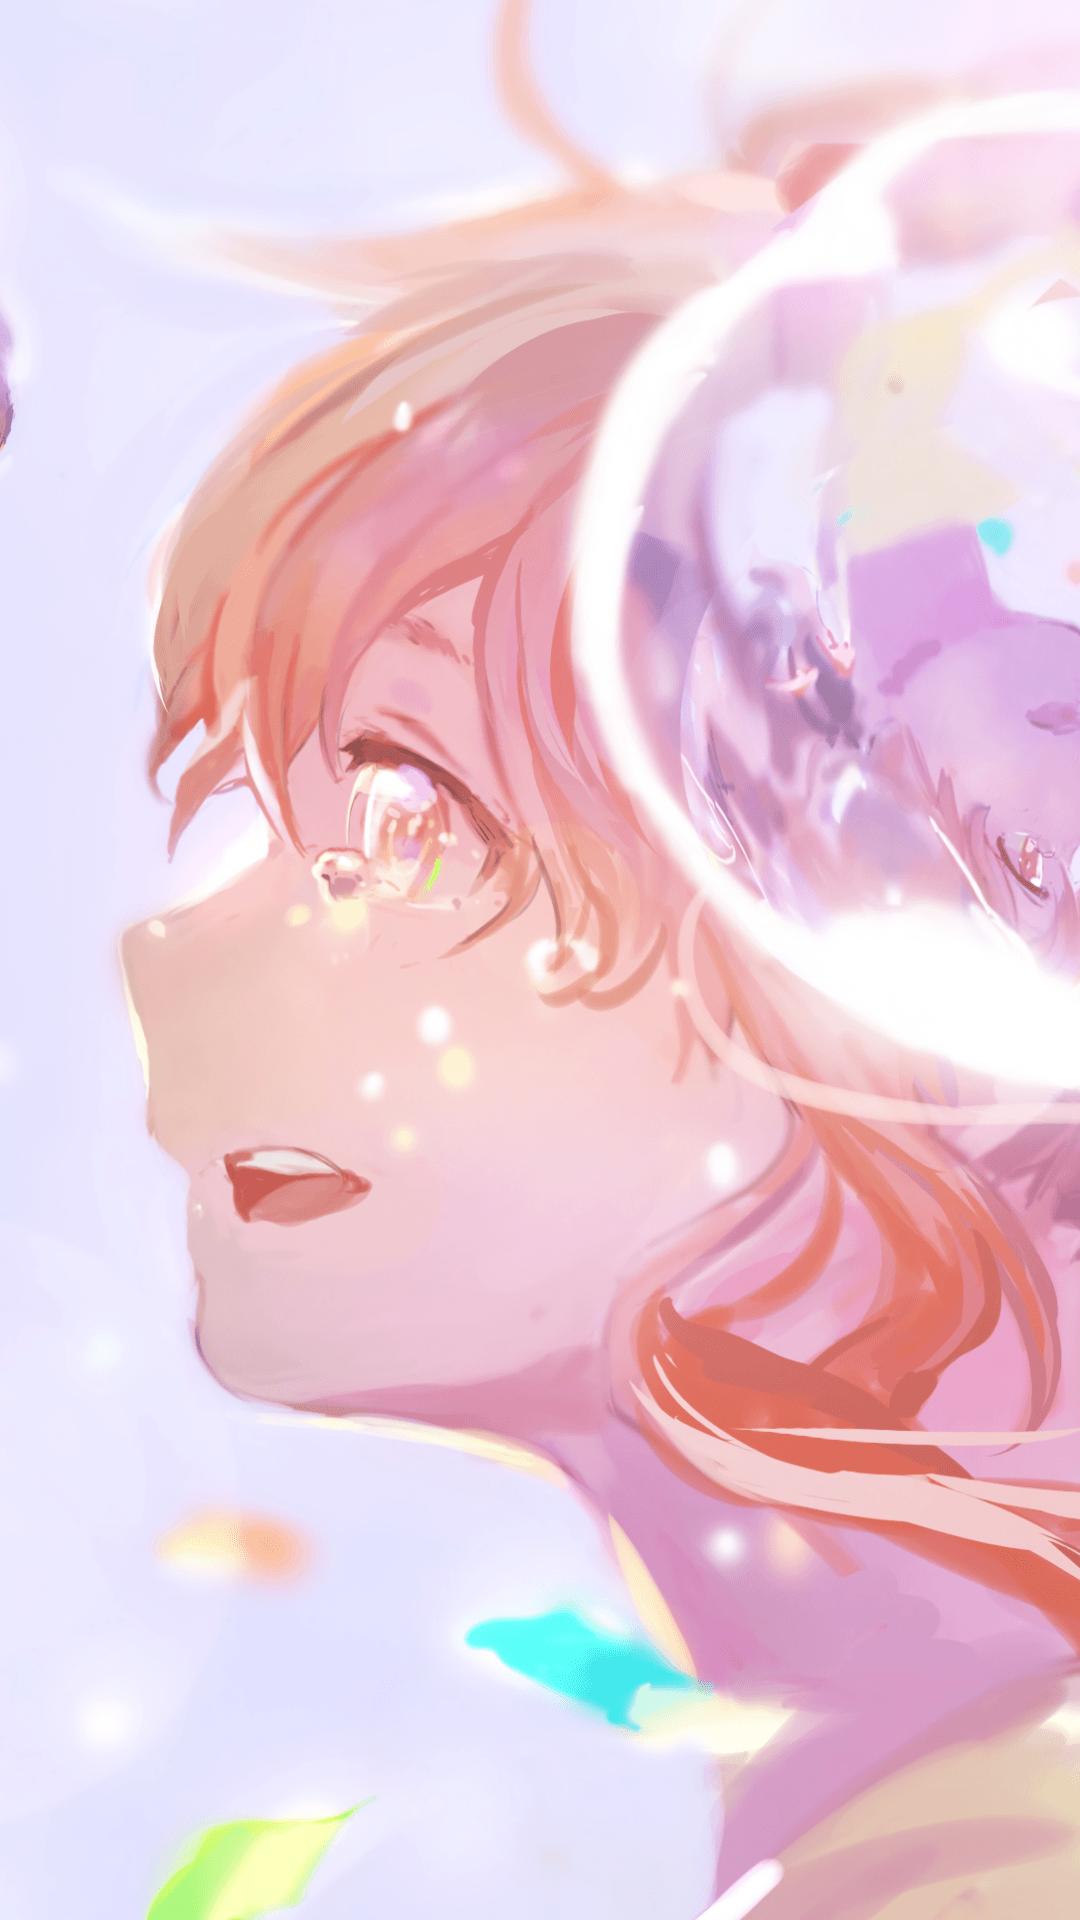 Wallpaper iphone tumblr anime